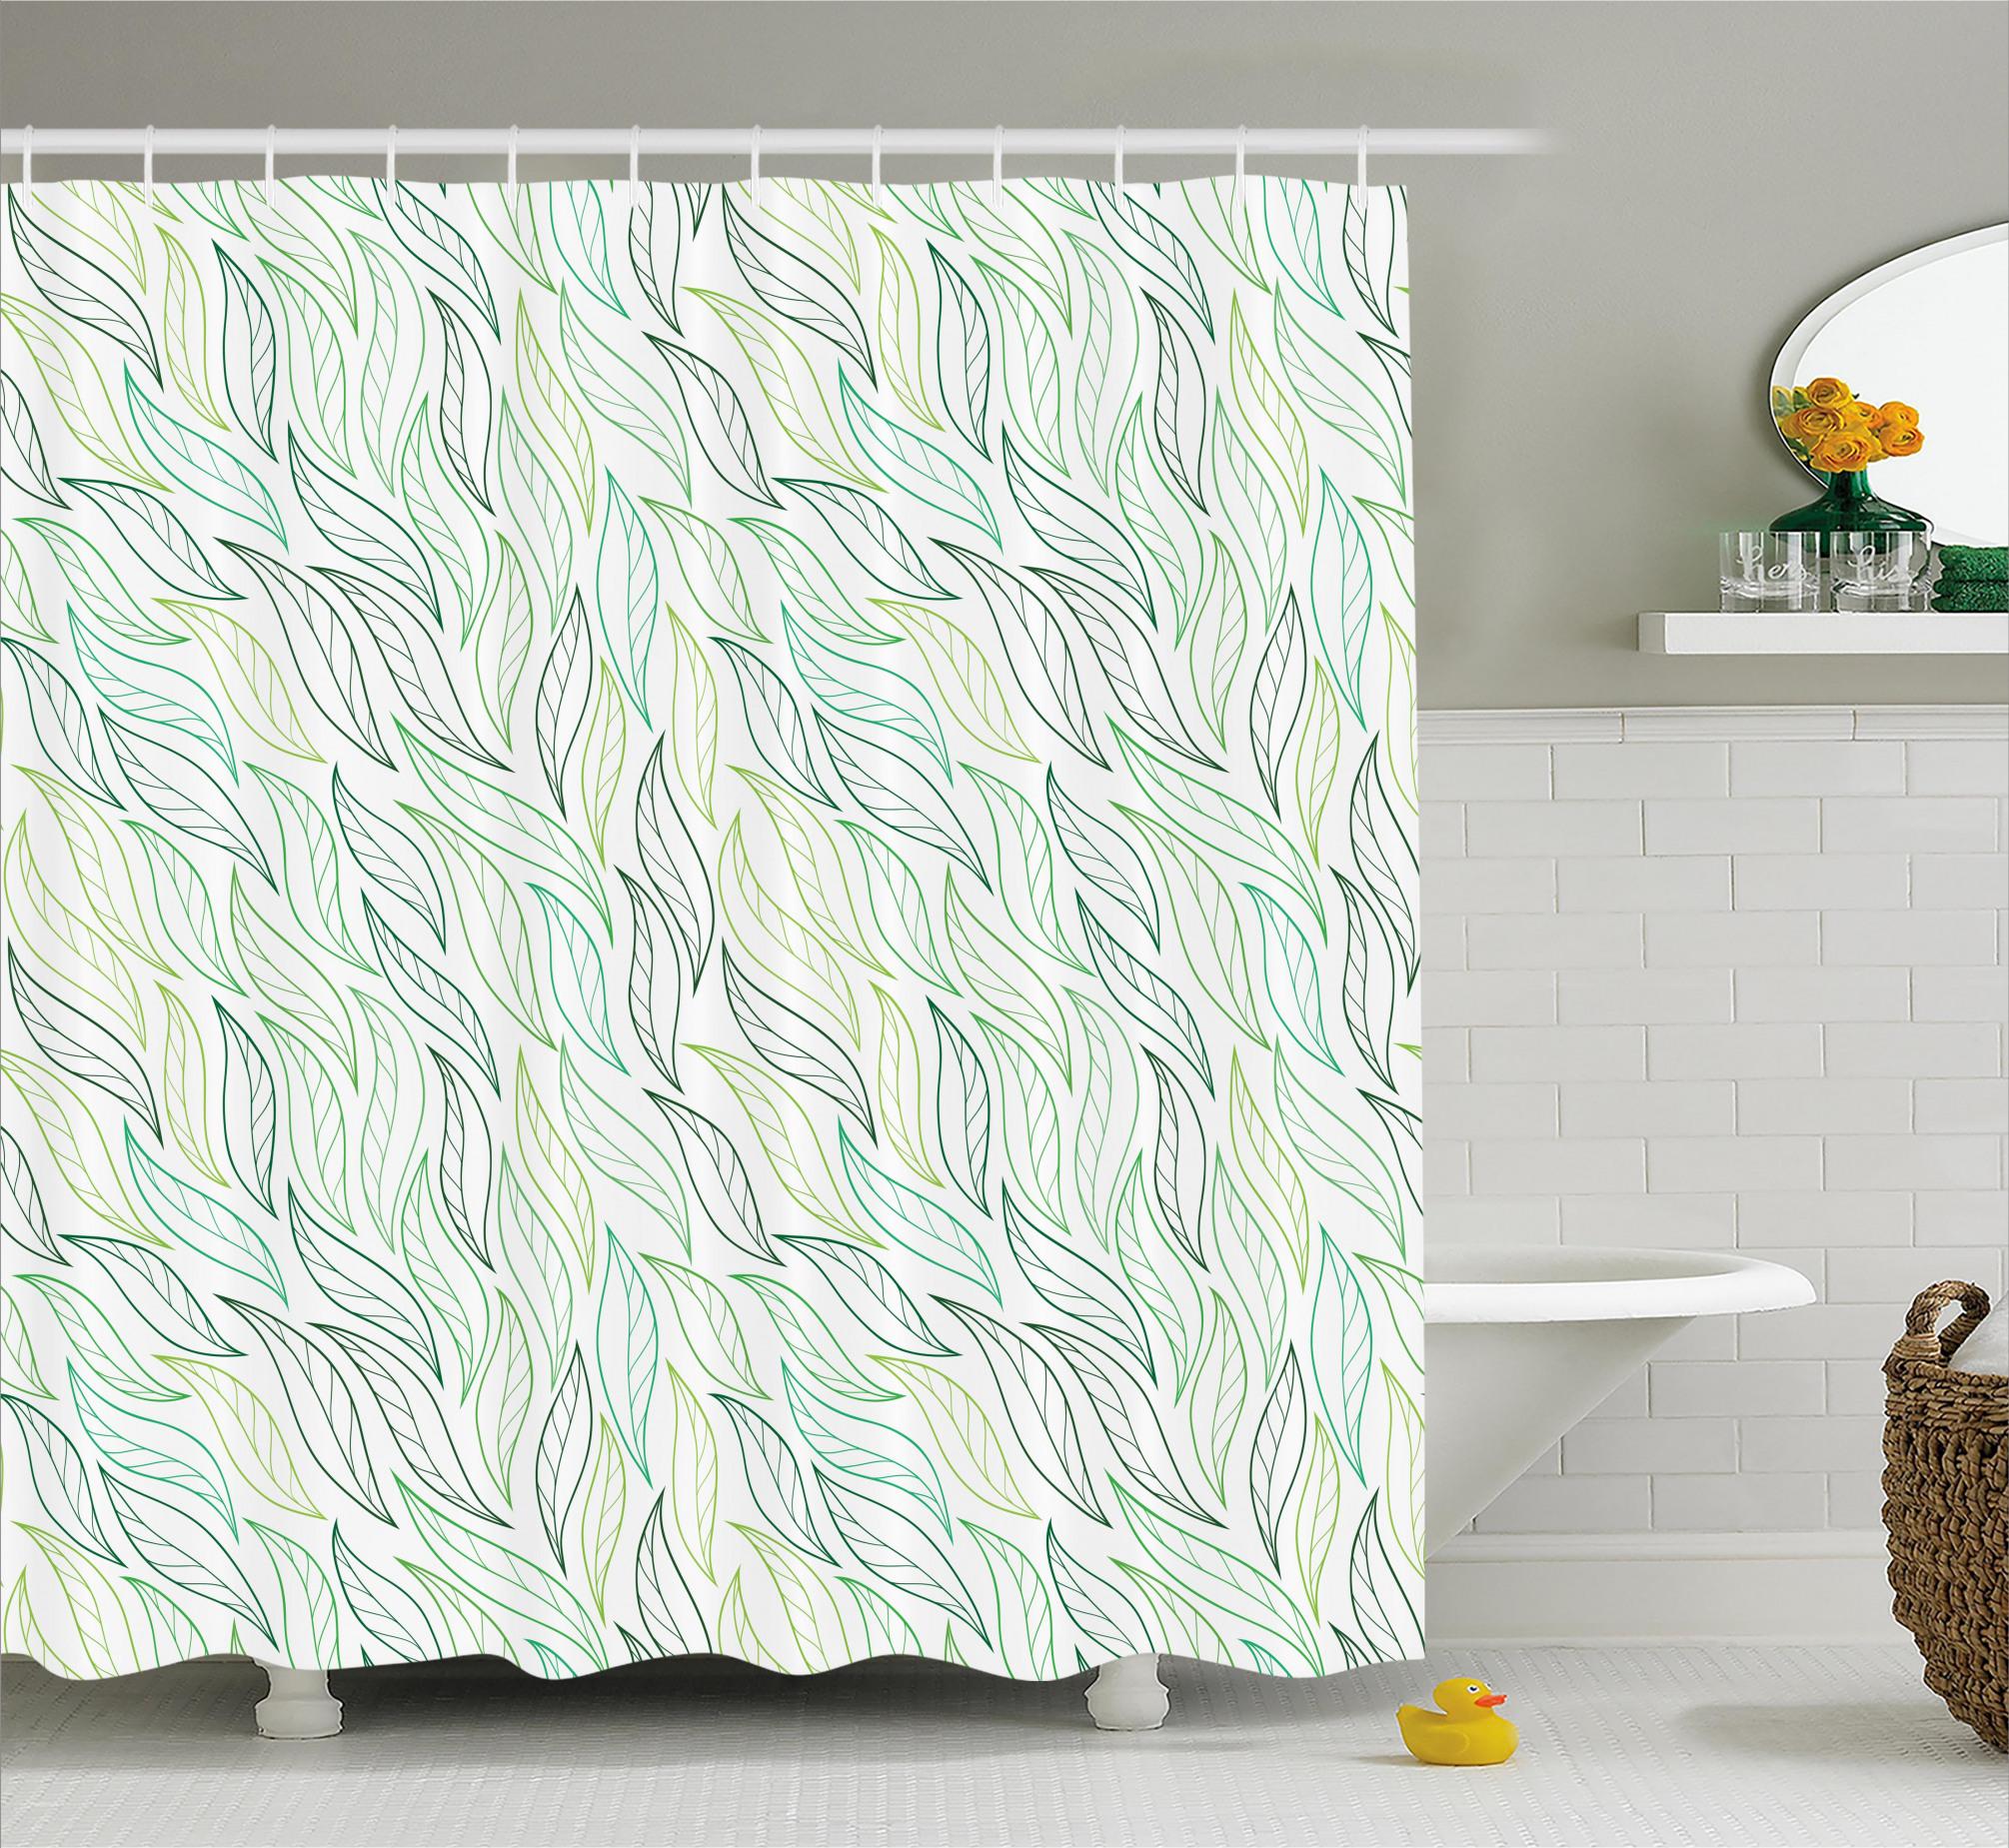 3990 Modern Leaf Patterns Shower Curtain